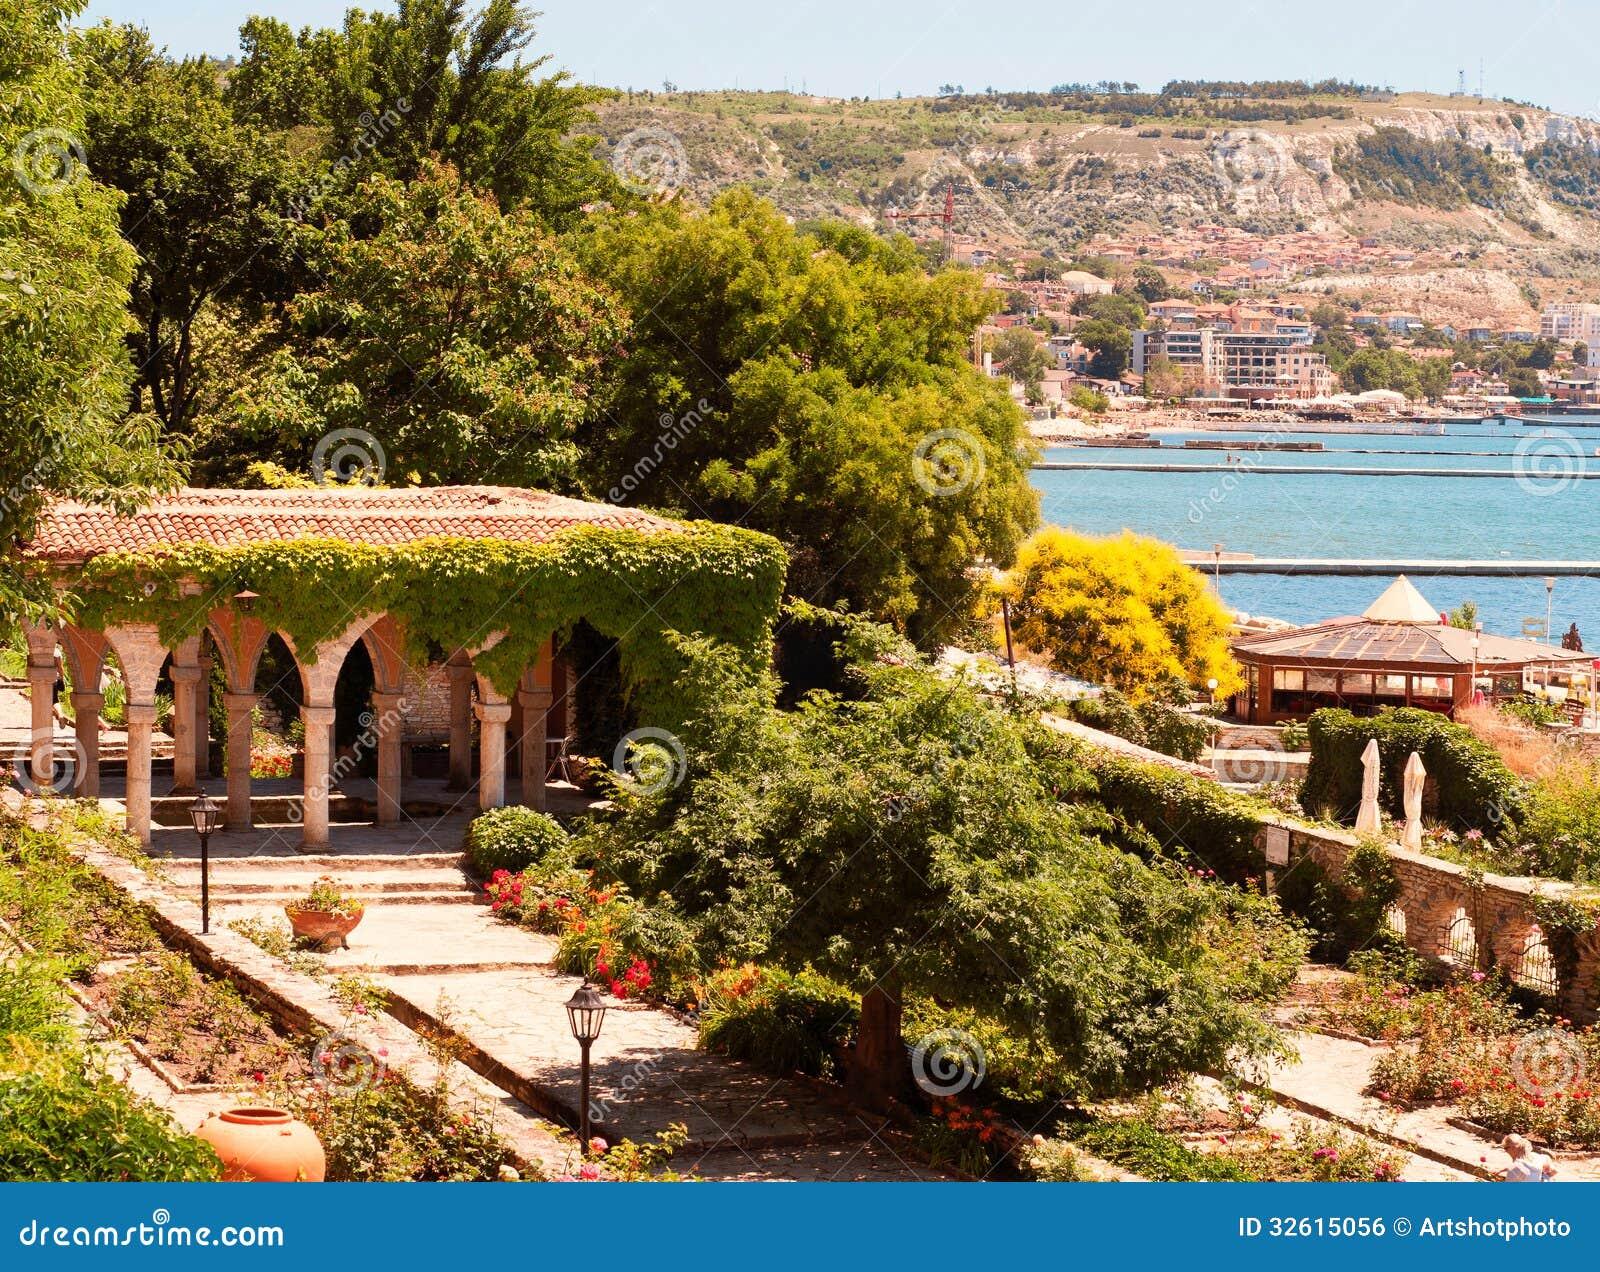 Roman Bath In The Garden Of Balchik Castle Stock Photo - Image of ...